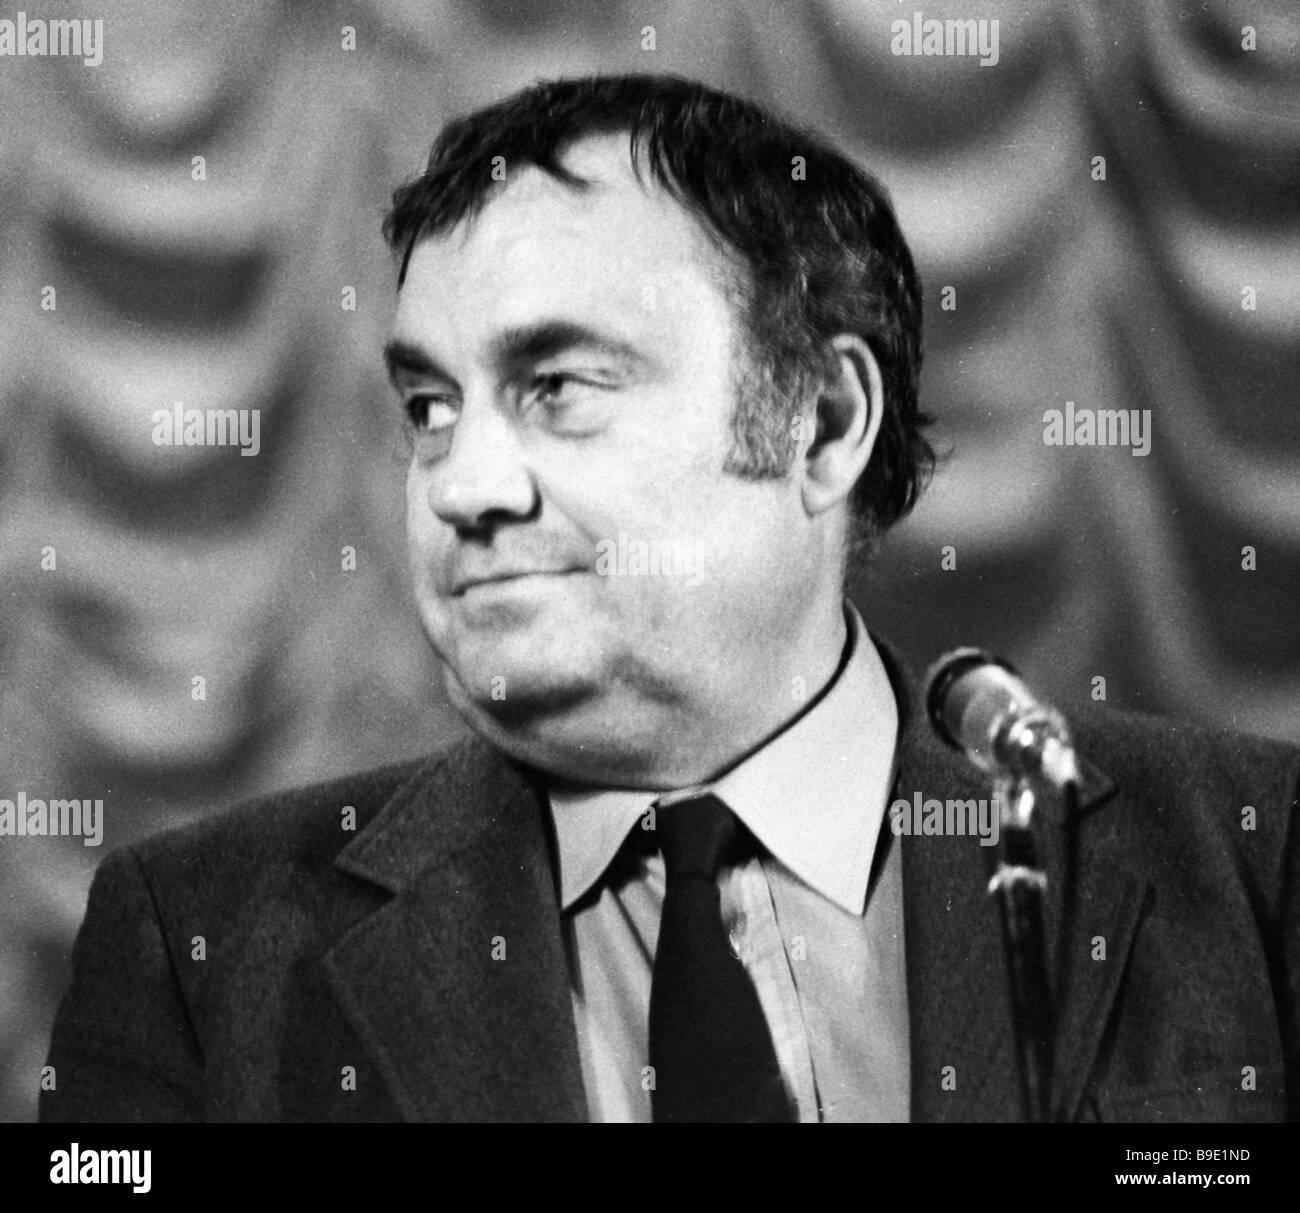 Why Eldar Ryazanov made a film Garage 26